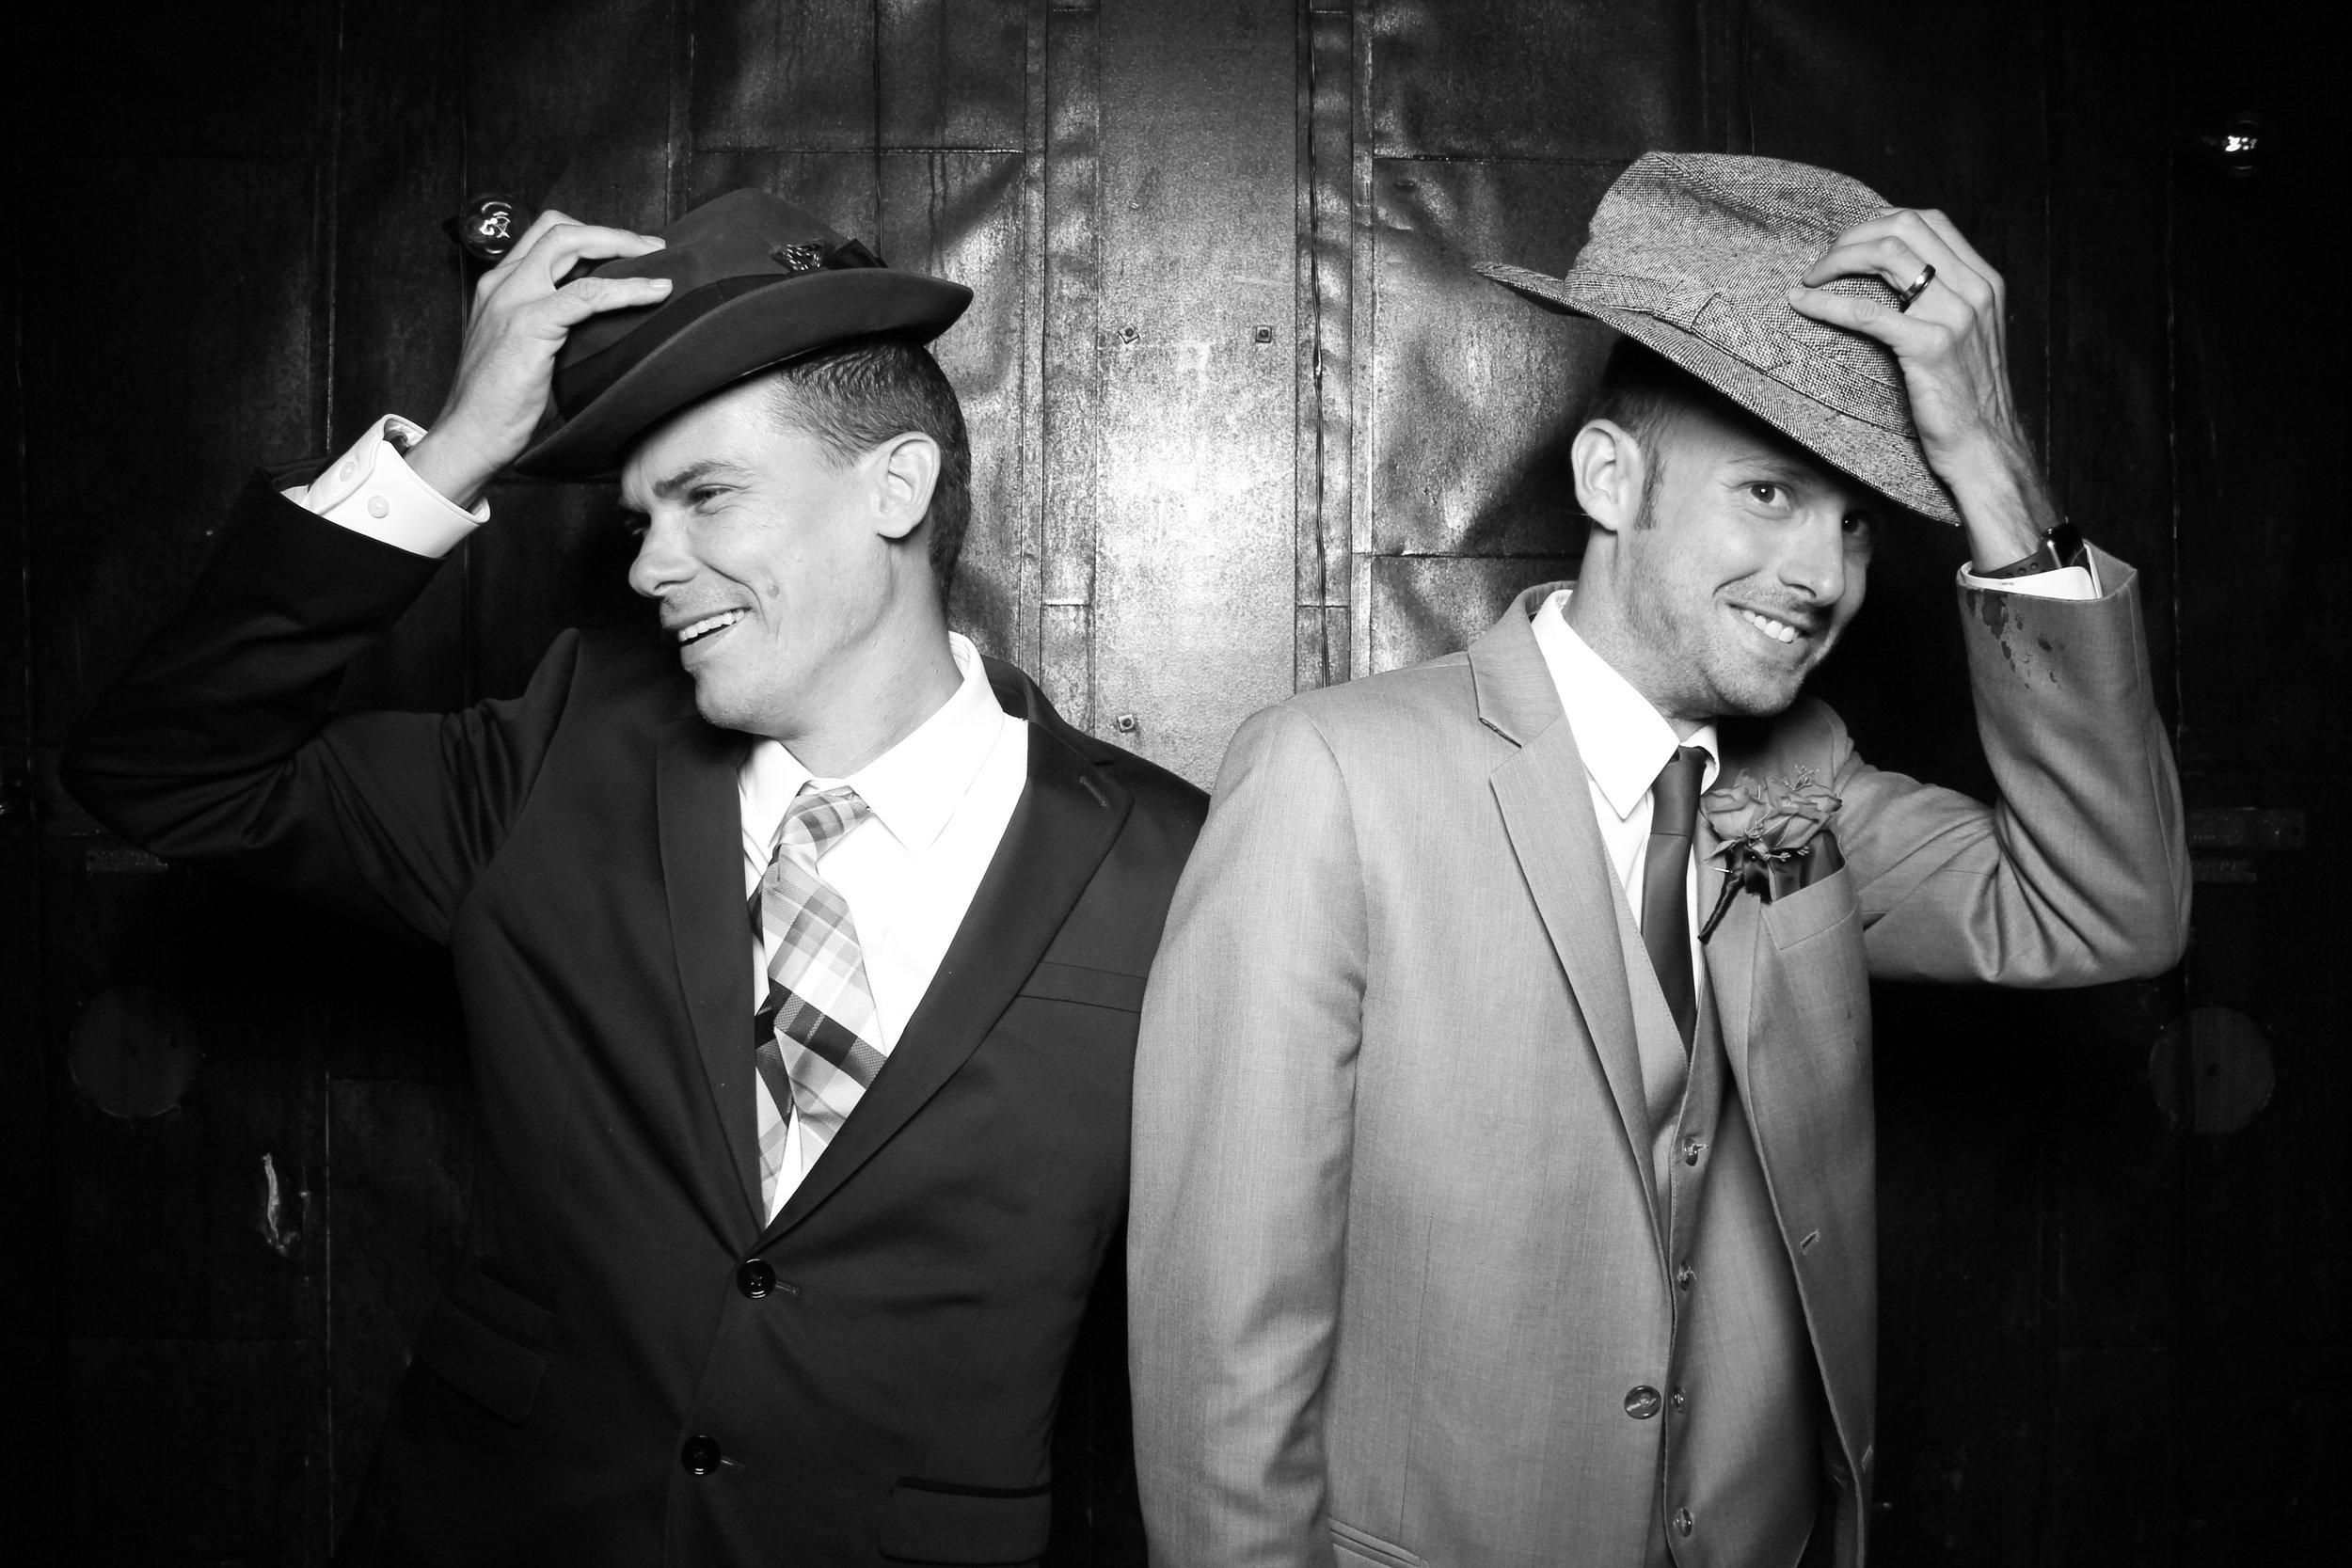 Chicago_Vintage_Wedding_Photobooth_Morgan_Manufacturing_07.jpg